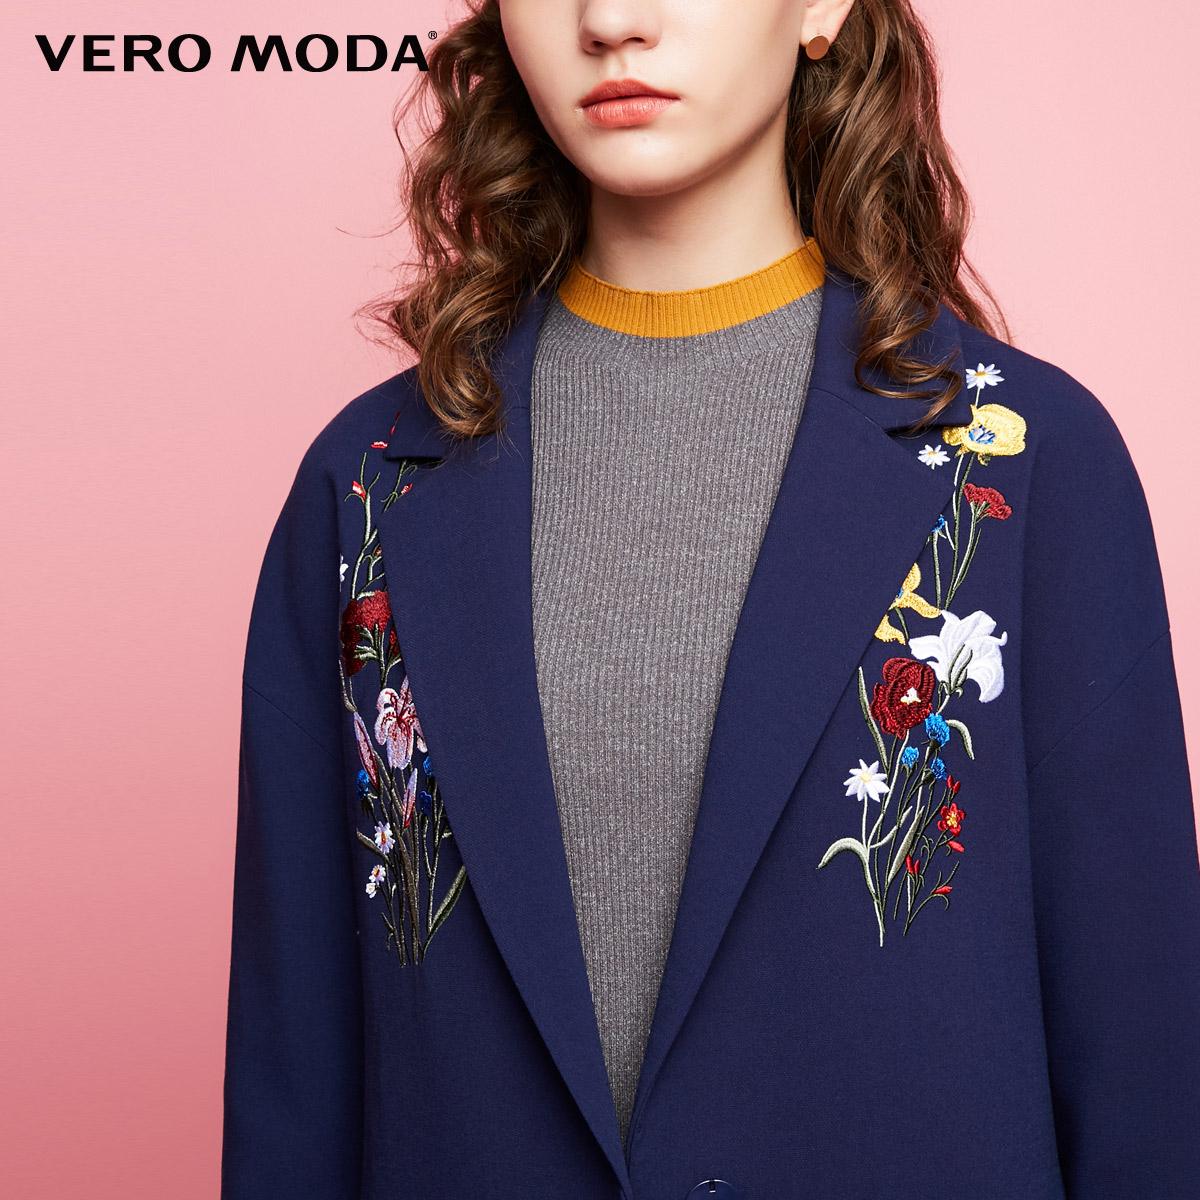 Vero Moda2017秋季新款精美刺绣系带中长款风衣|317321522